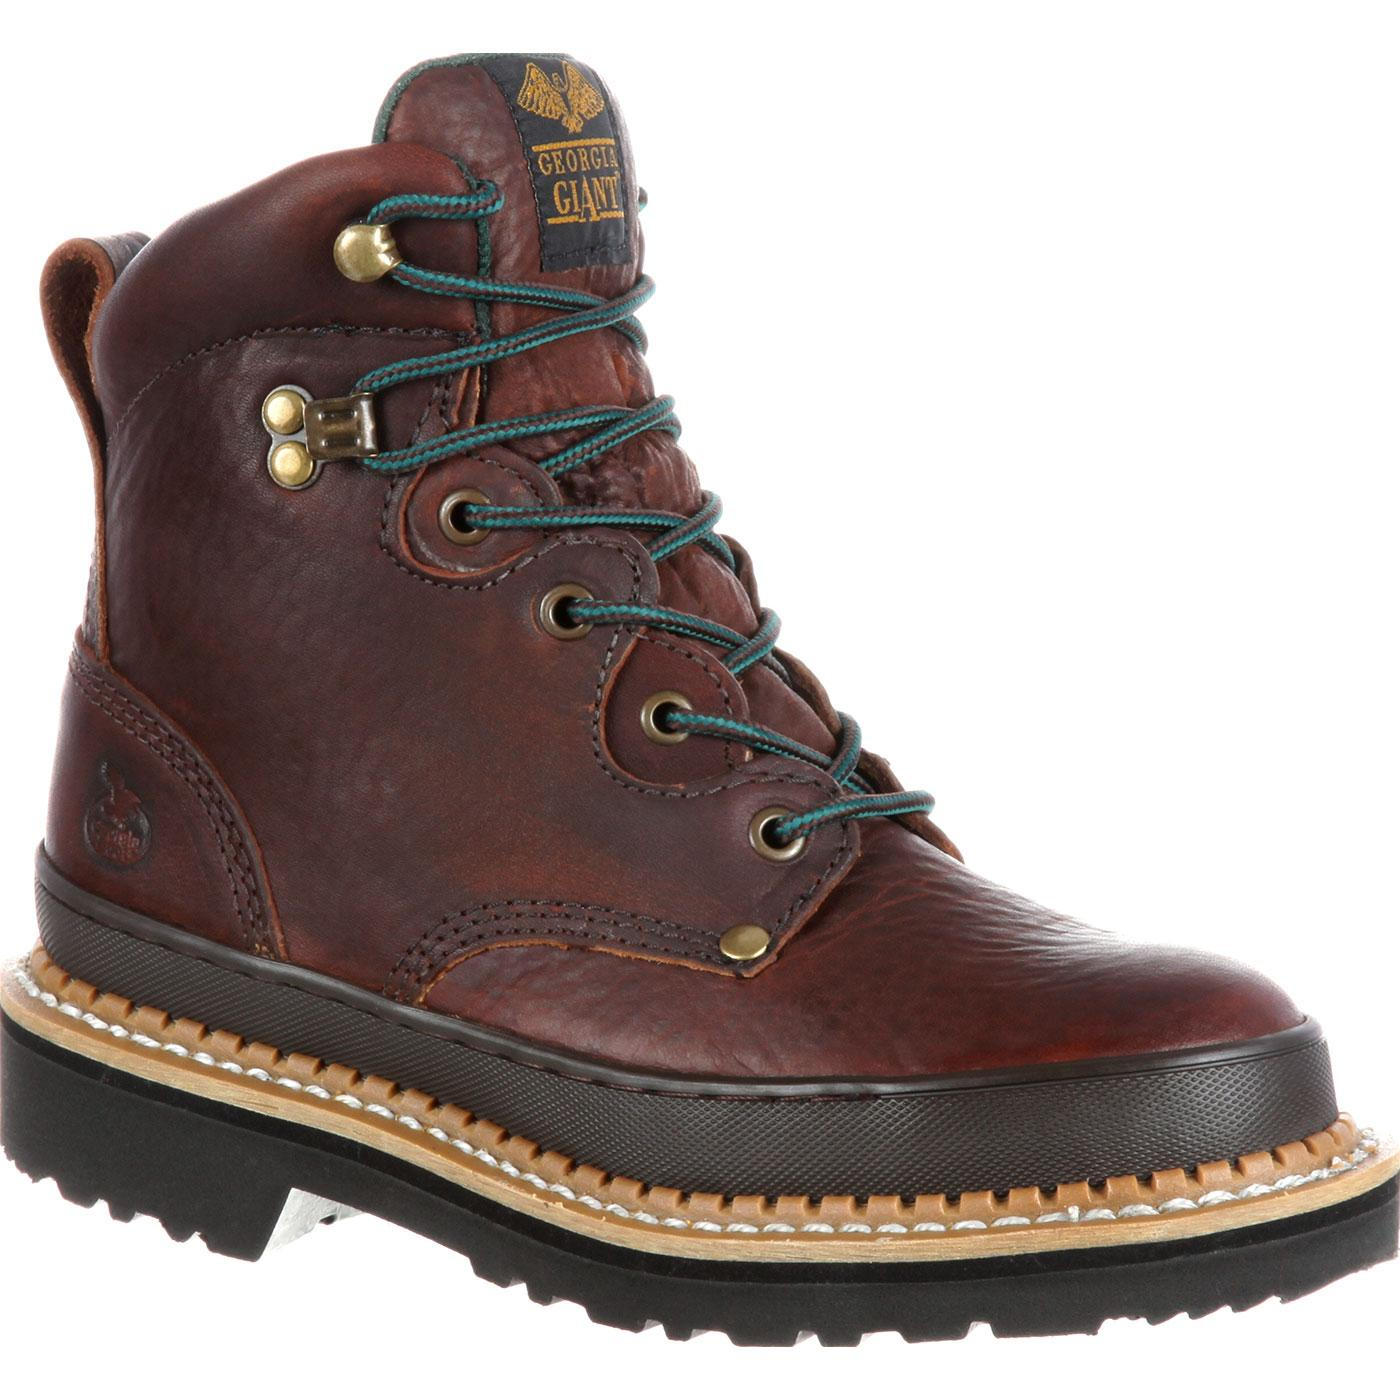 Georgia Giant Women S Steel Toe Work Boots Style G3374